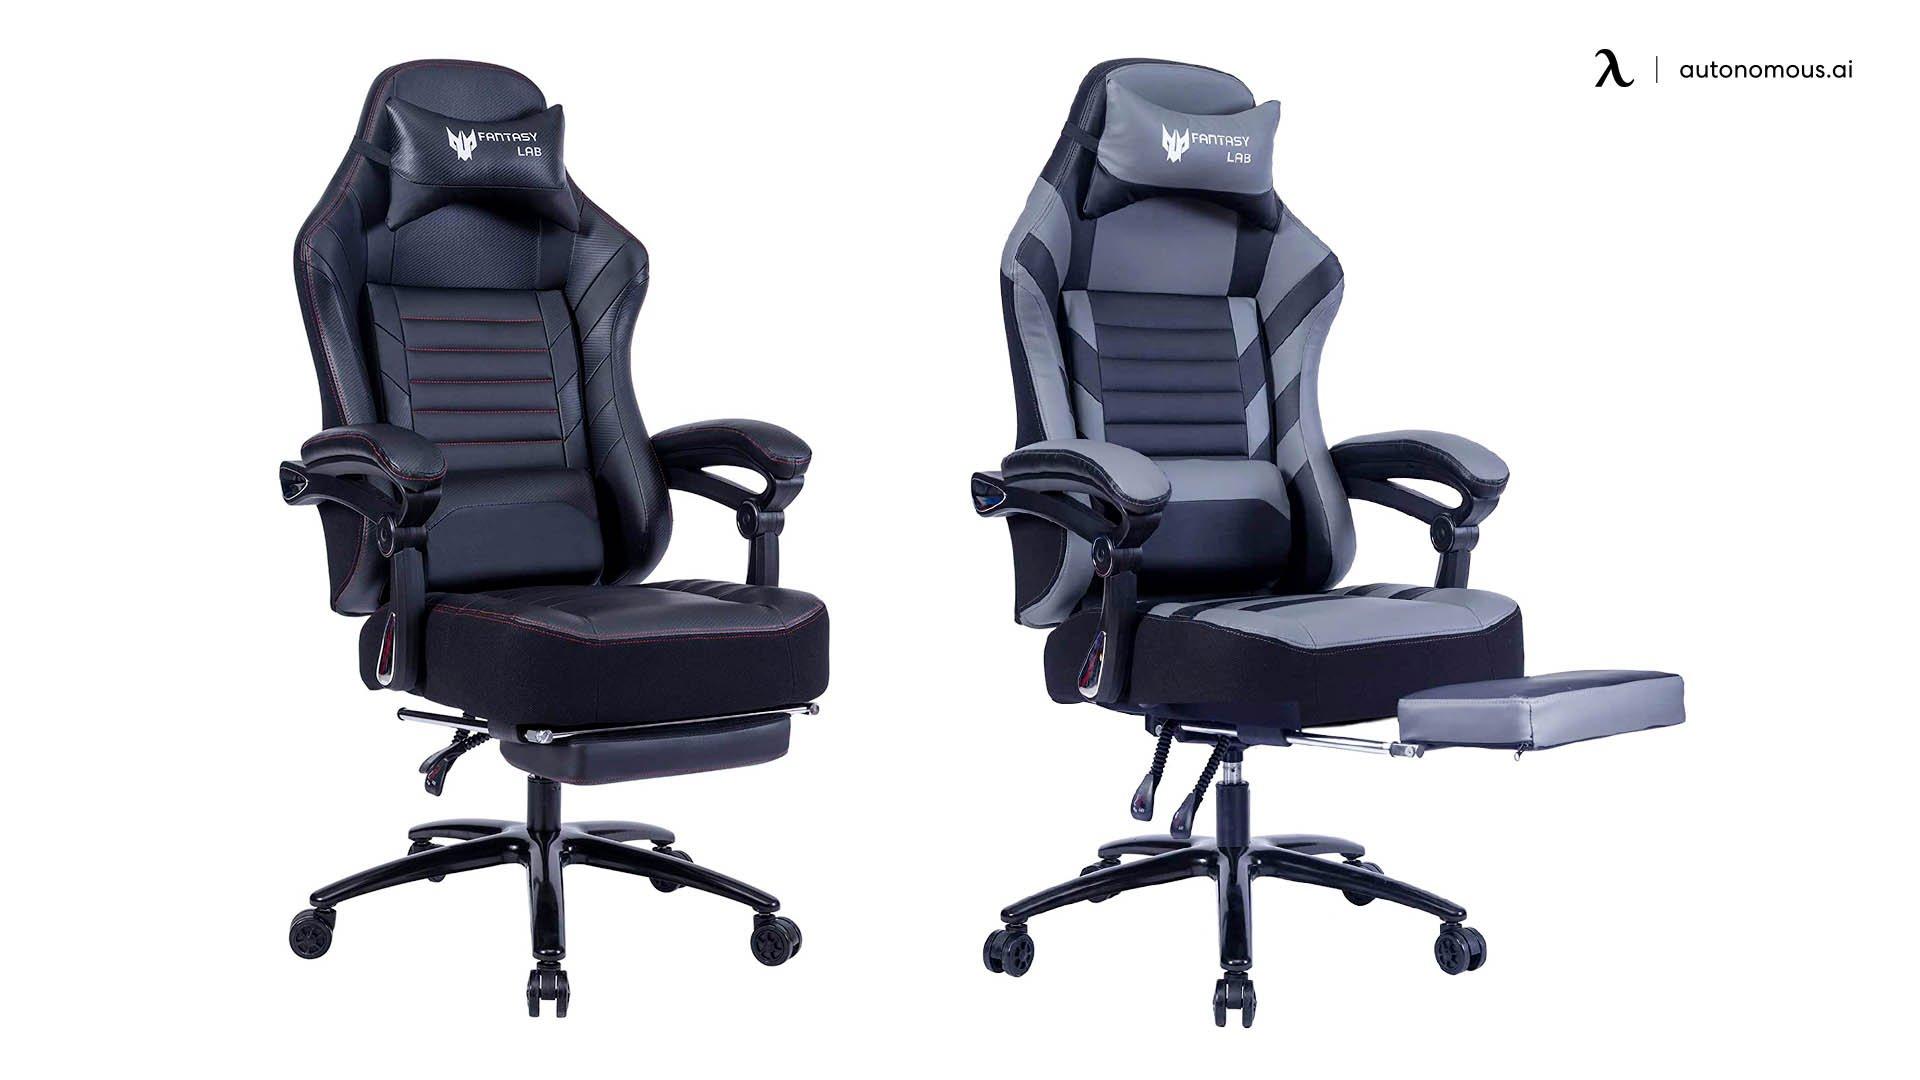 FANTASYLAB Ergonomic Reclining Chair with Footrest